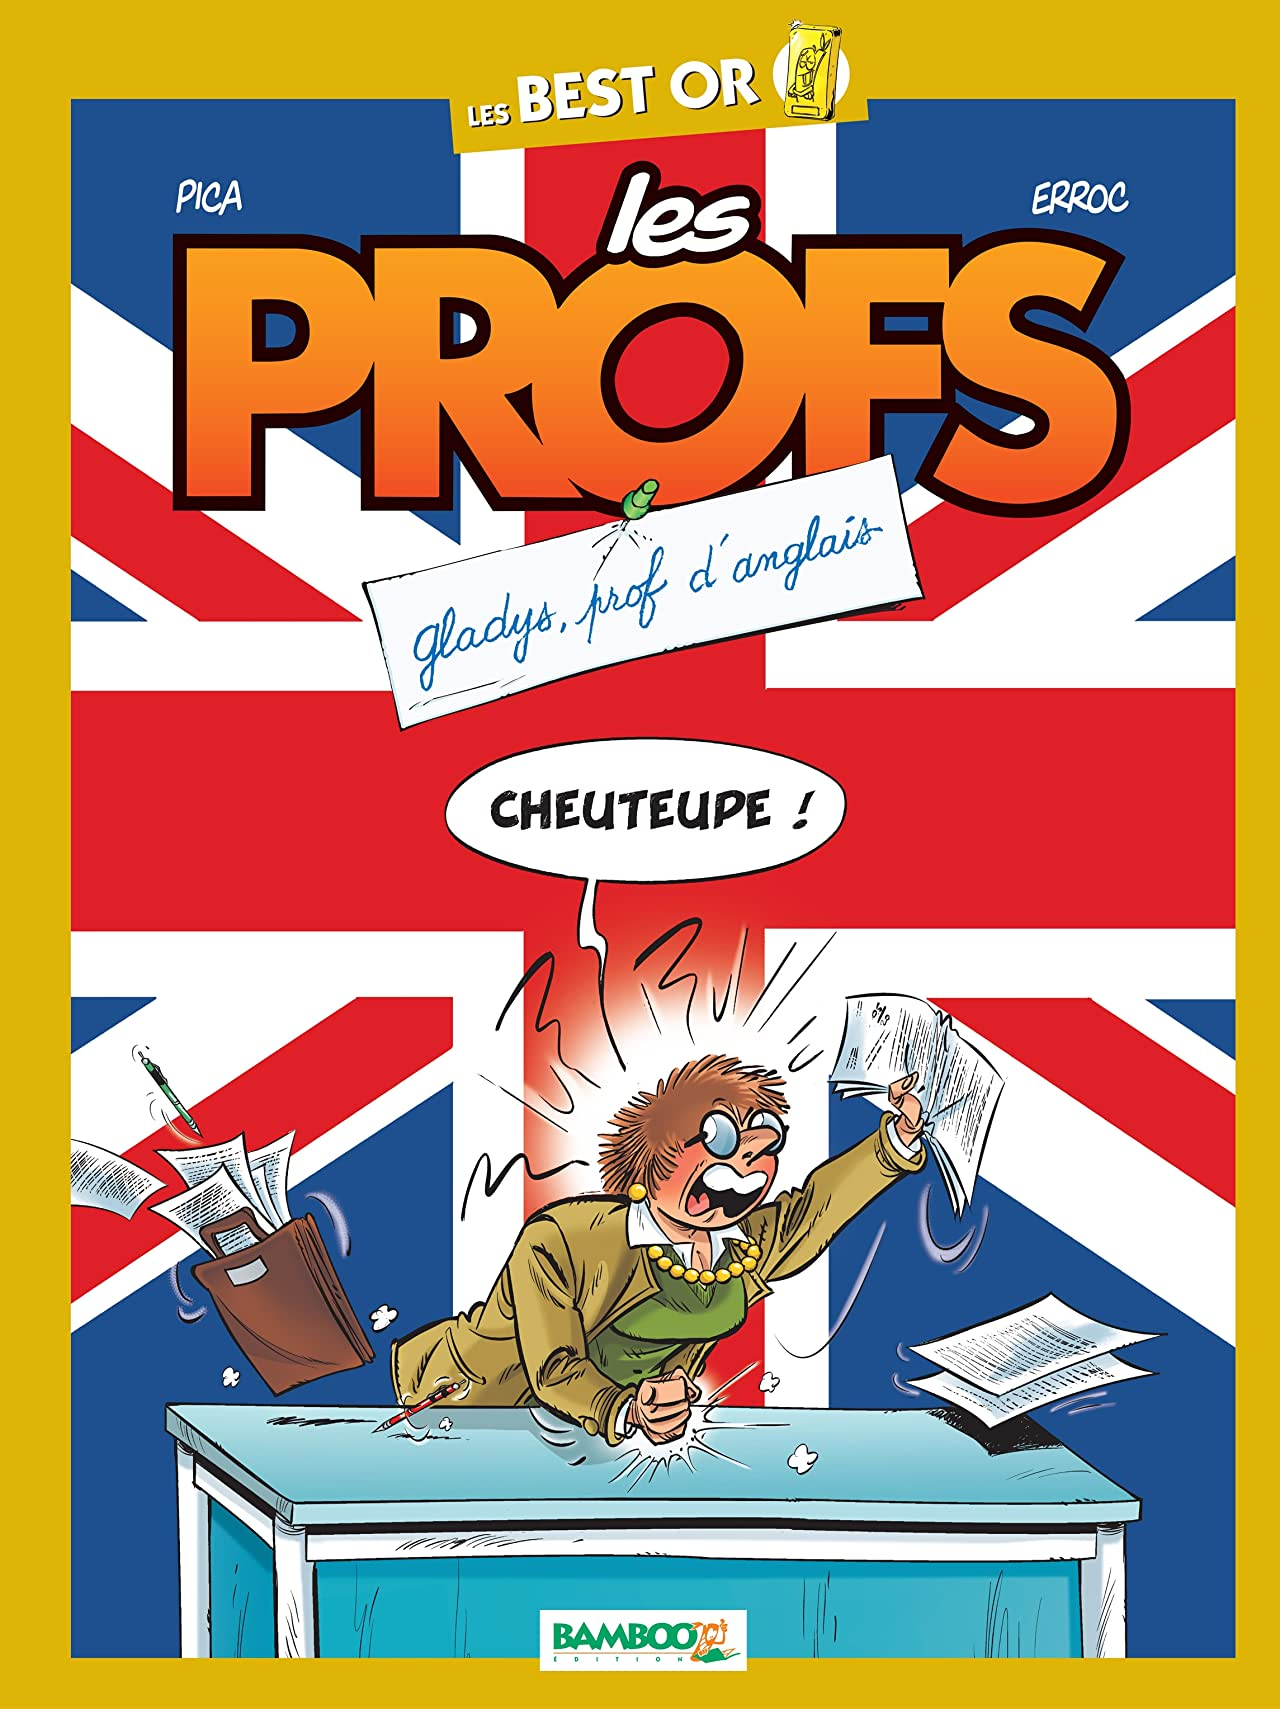 Les Profs: Gladys,  prof d'anglais: best-of